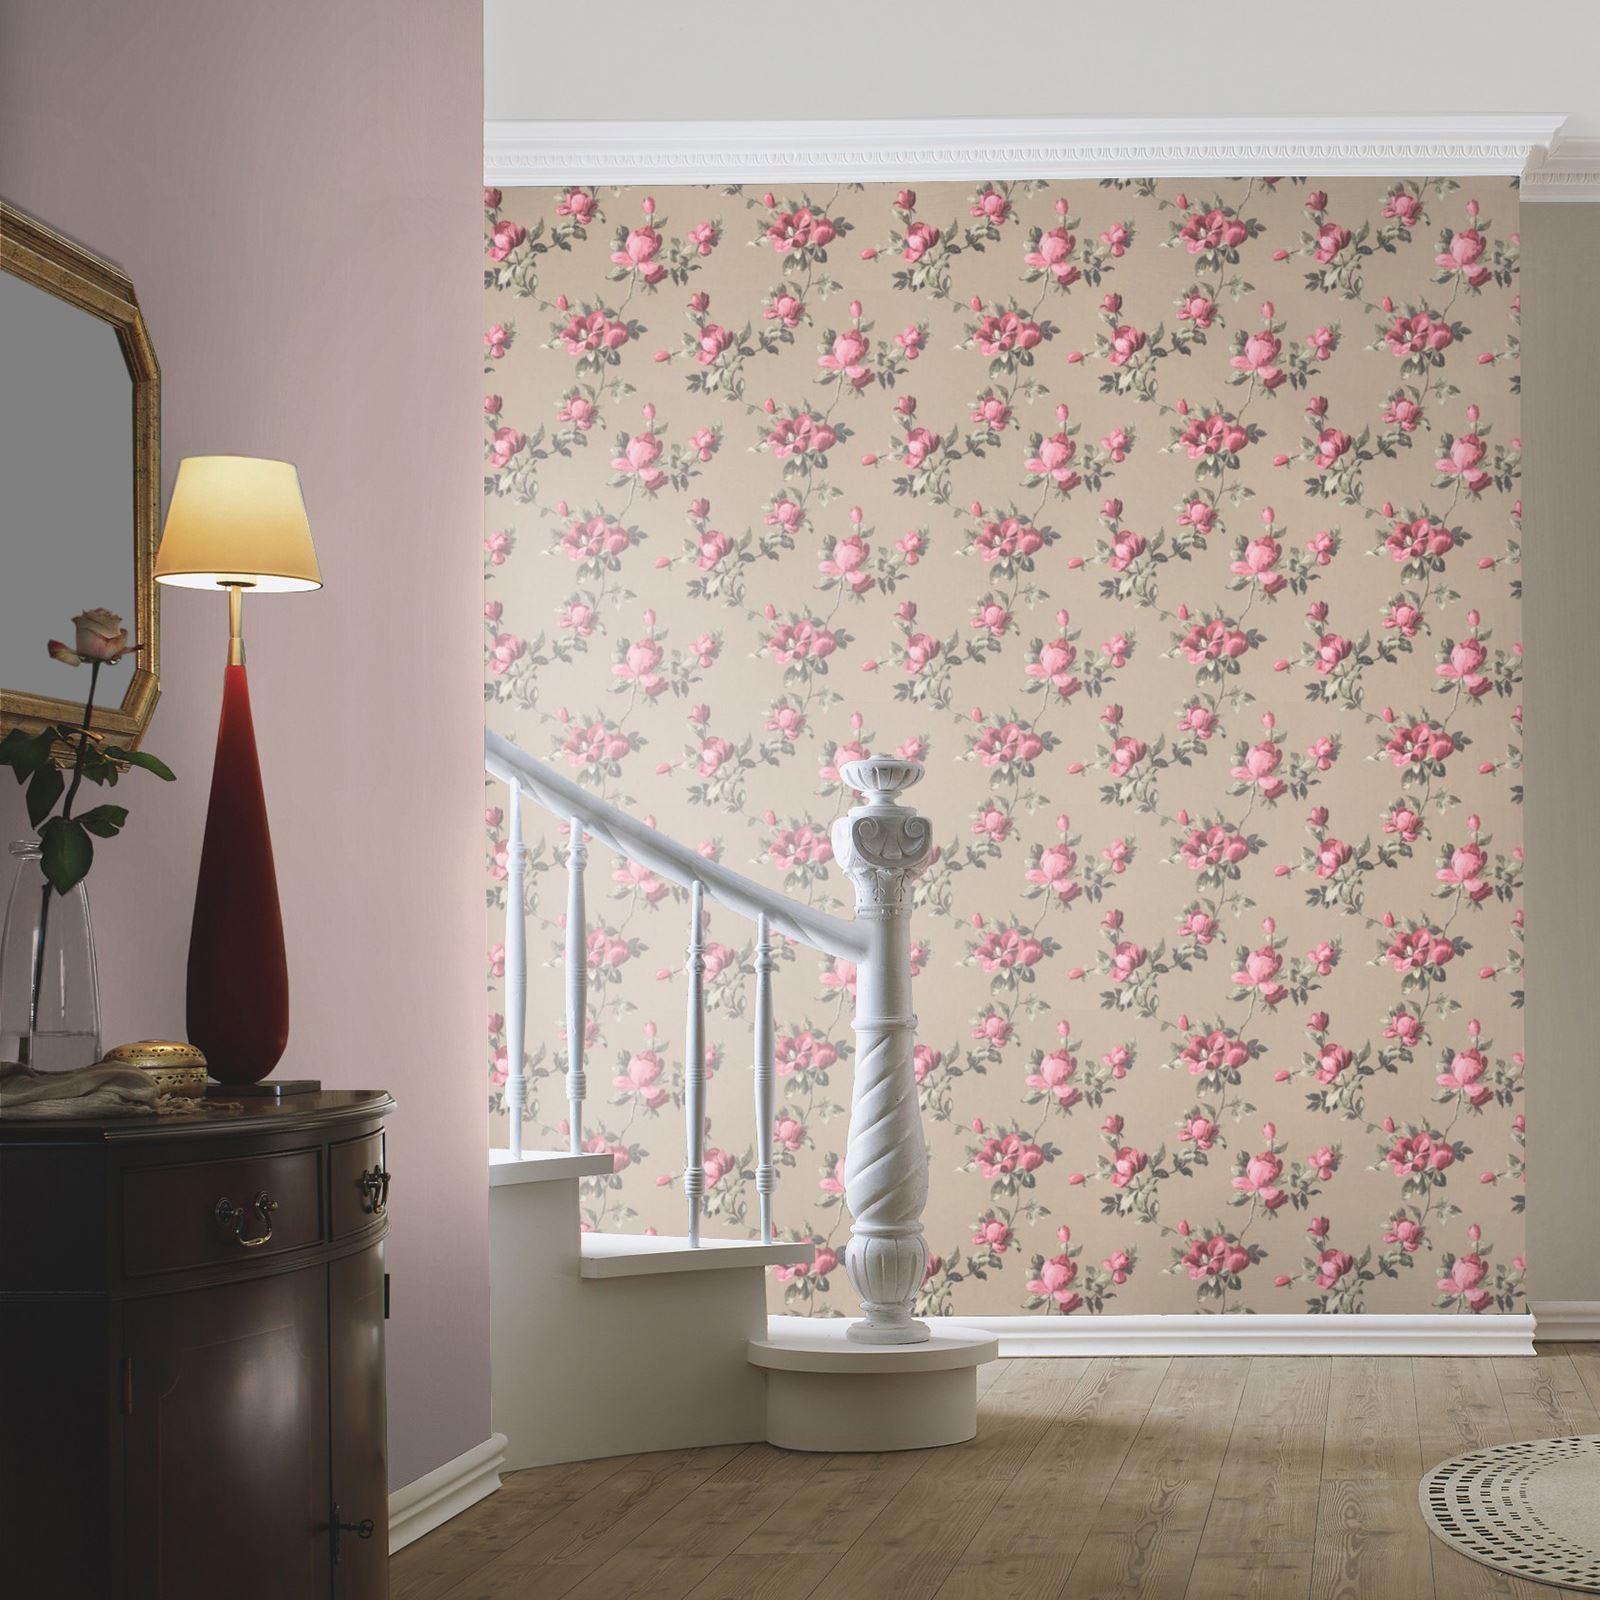 emilia rose blumen tapete gold pink rasch 502138 blumen neu ebay. Black Bedroom Furniture Sets. Home Design Ideas